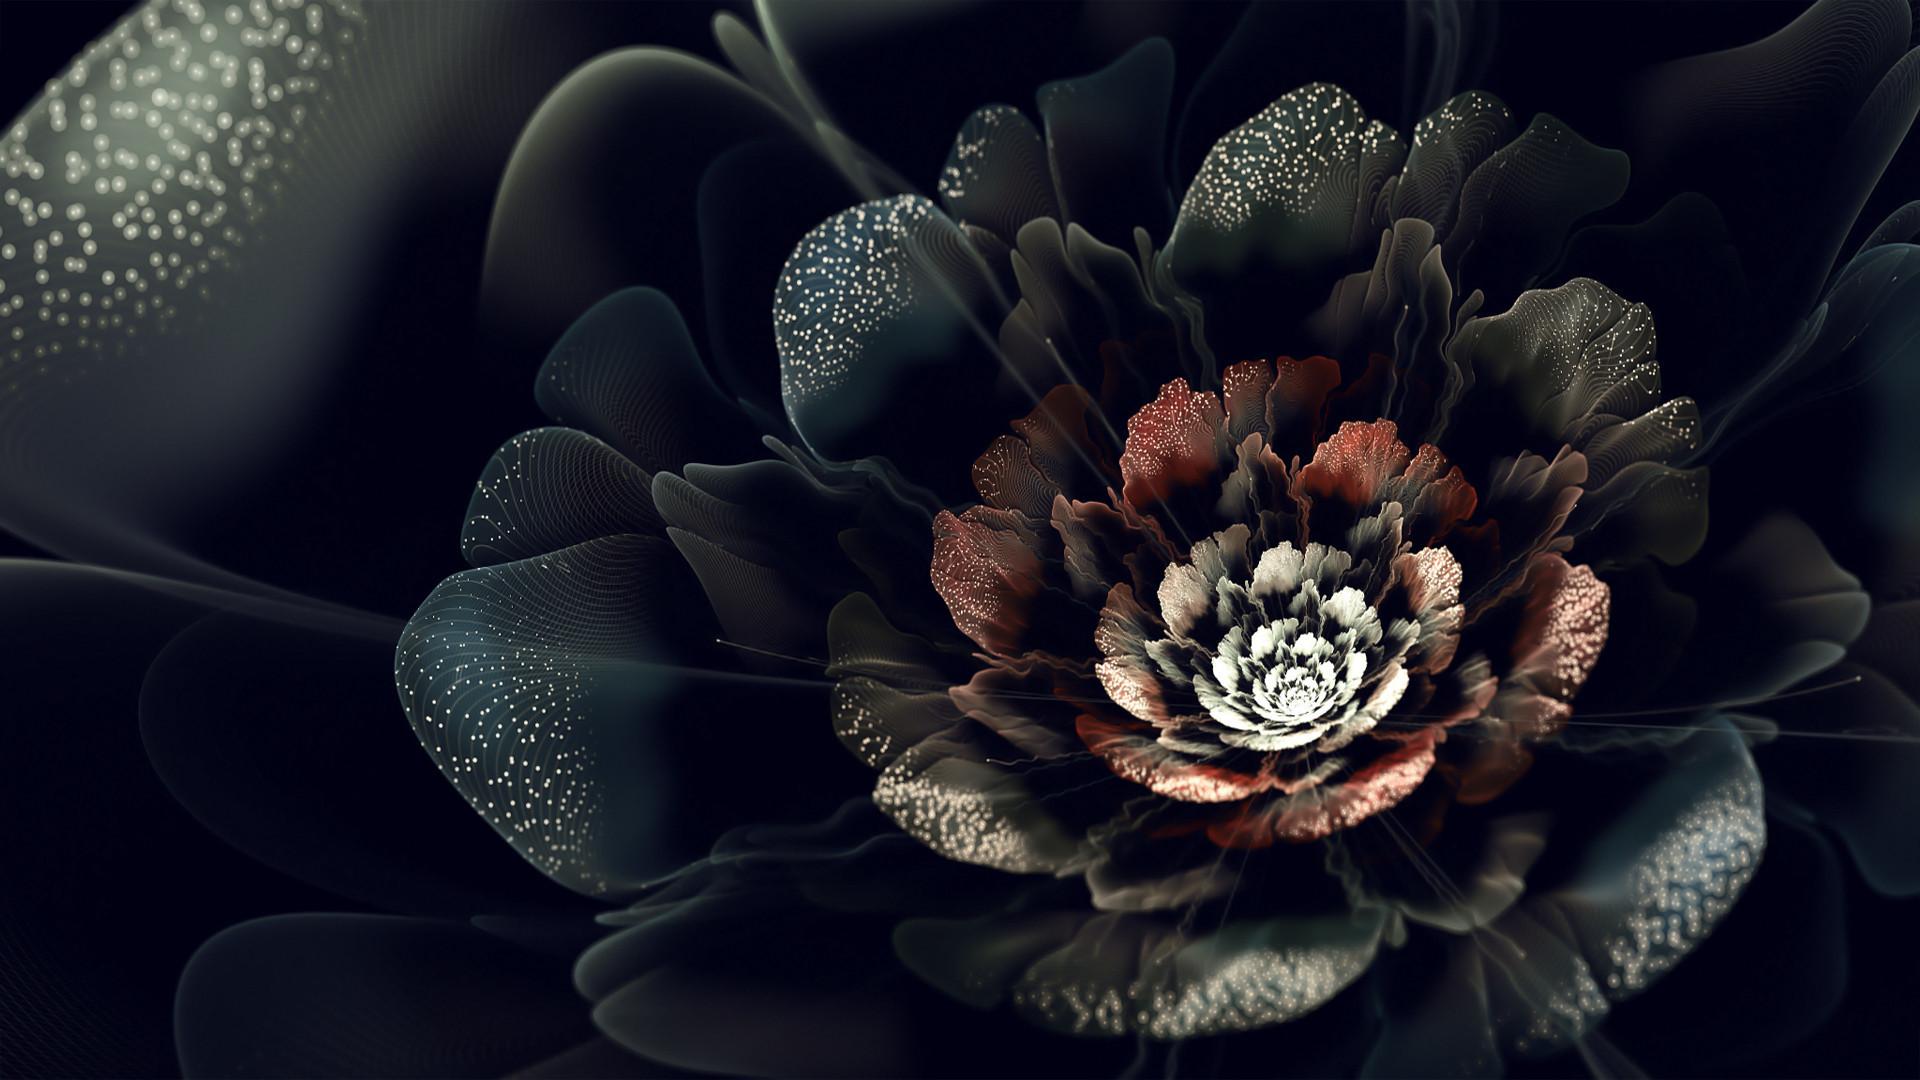 The Rose of Love roses Wallpaper Les jolie rose Pinterest | HD Wallpapers |  Pinterest | Rose images, Hd wallpaper and Wallpaper